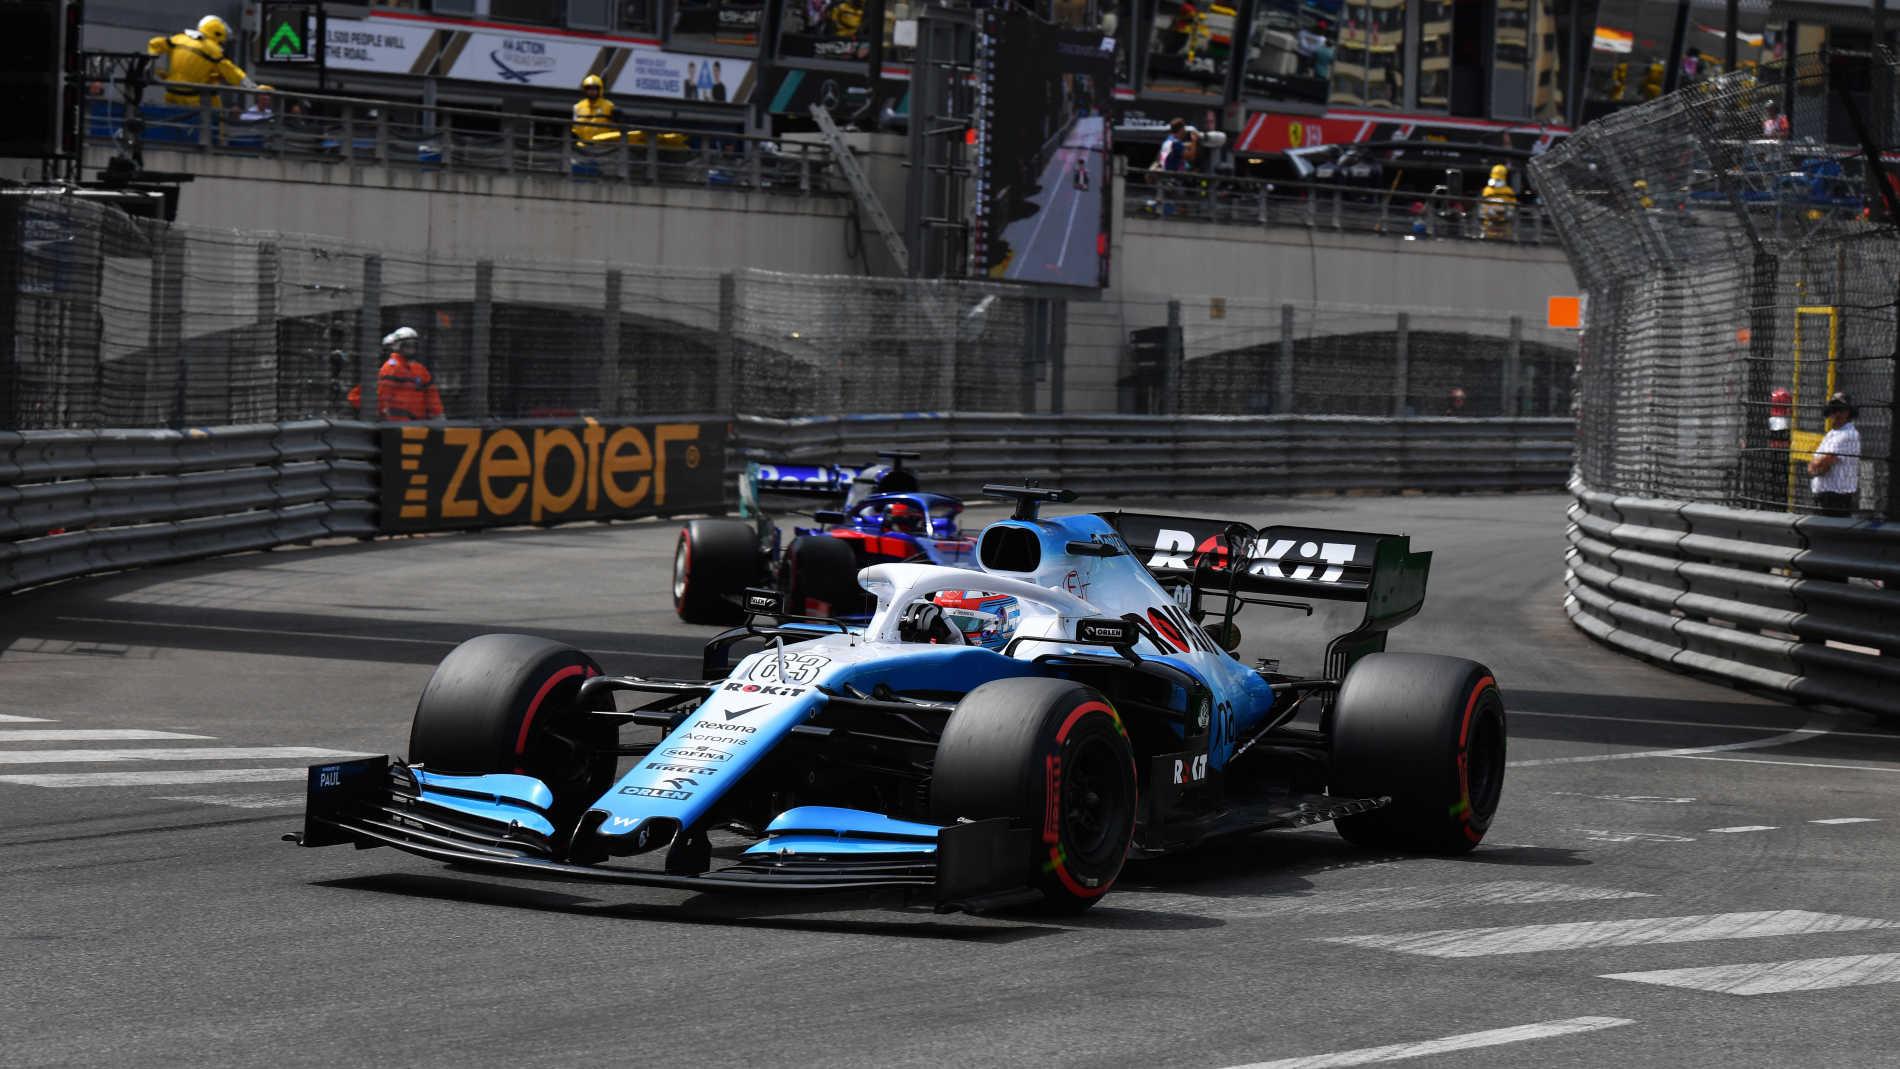 Mercedes set date for shakedown of new F1 car | Formula 1®  |Formula 1